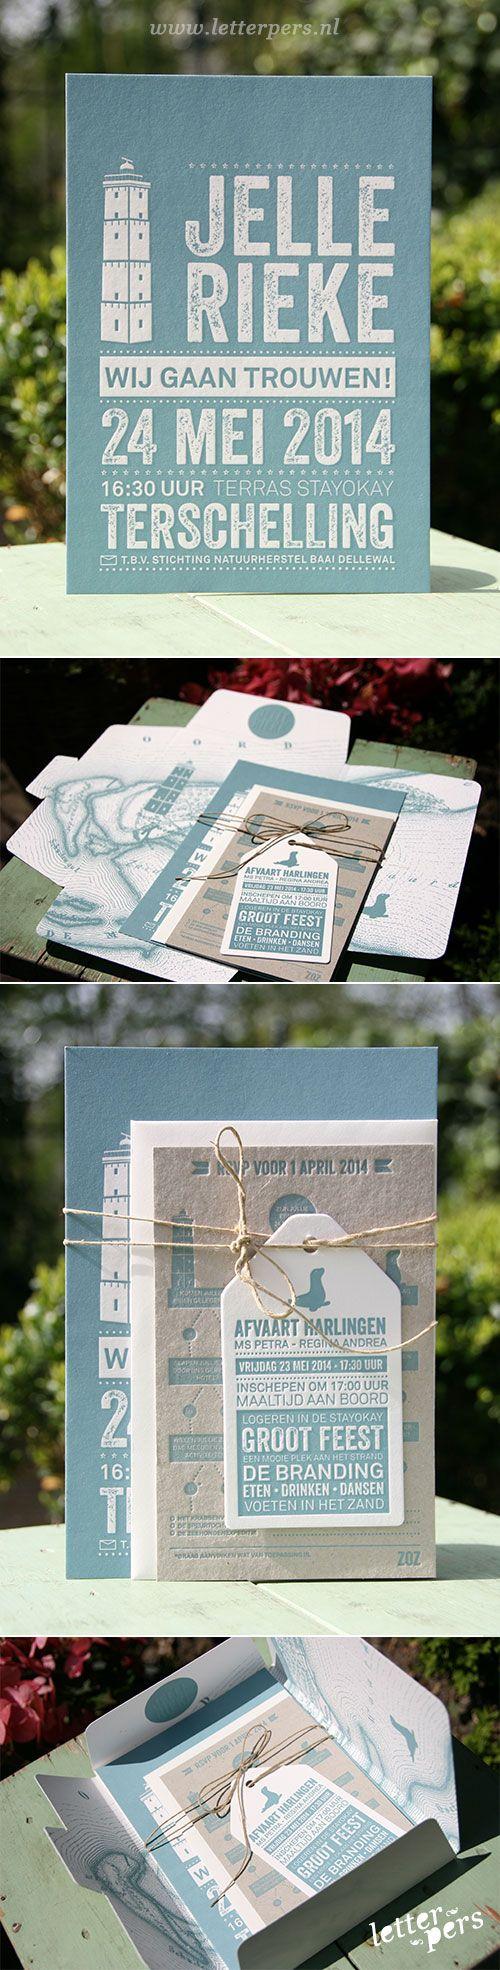 letterpers_letterpress_trouwkaart_rieke_jelle_prachtig_terschelling_compleet_brandaris_set